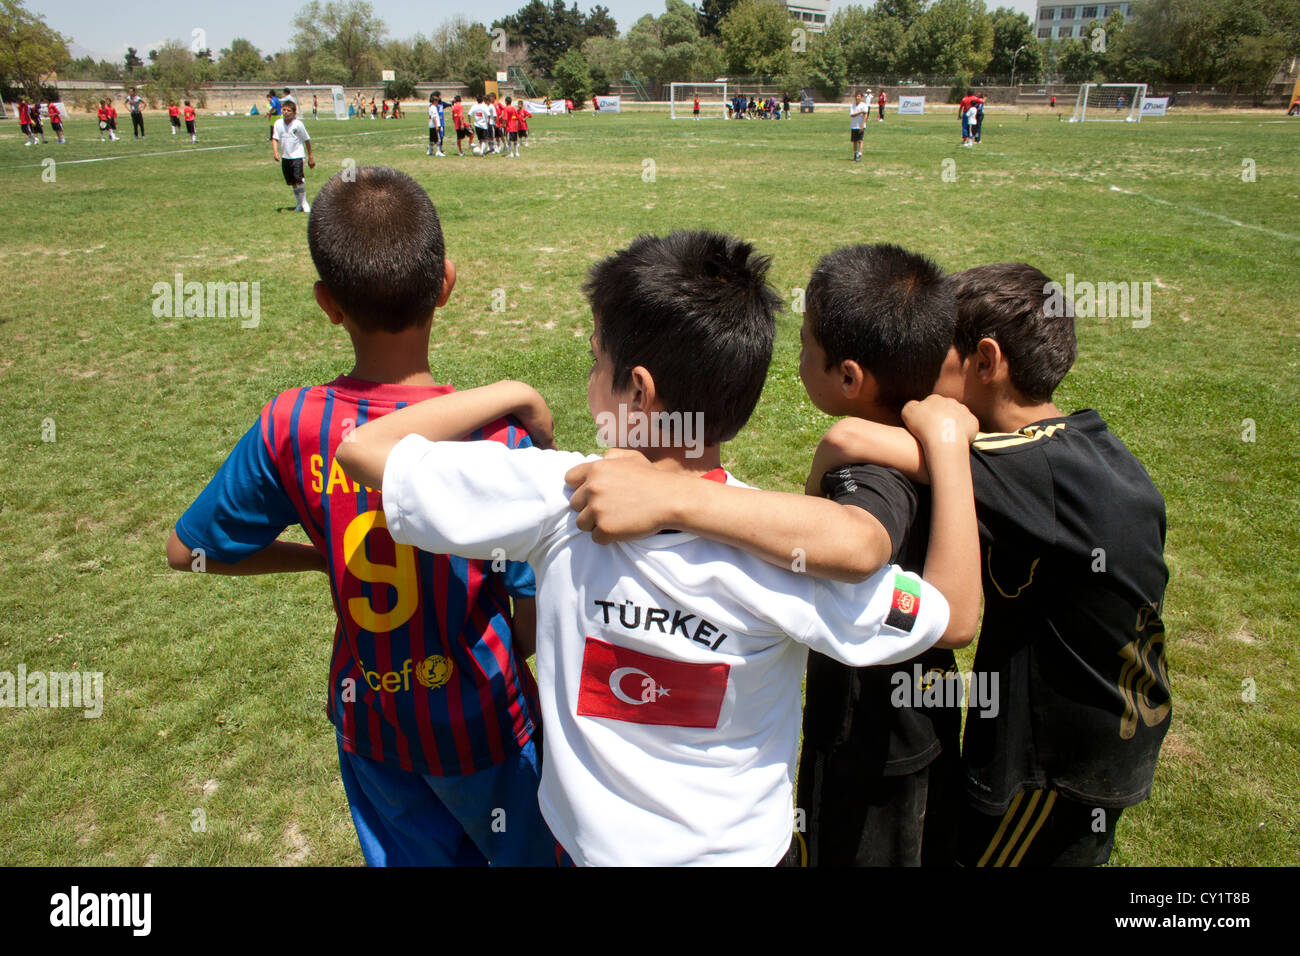 football players sports group sport player uniform - Stock Image